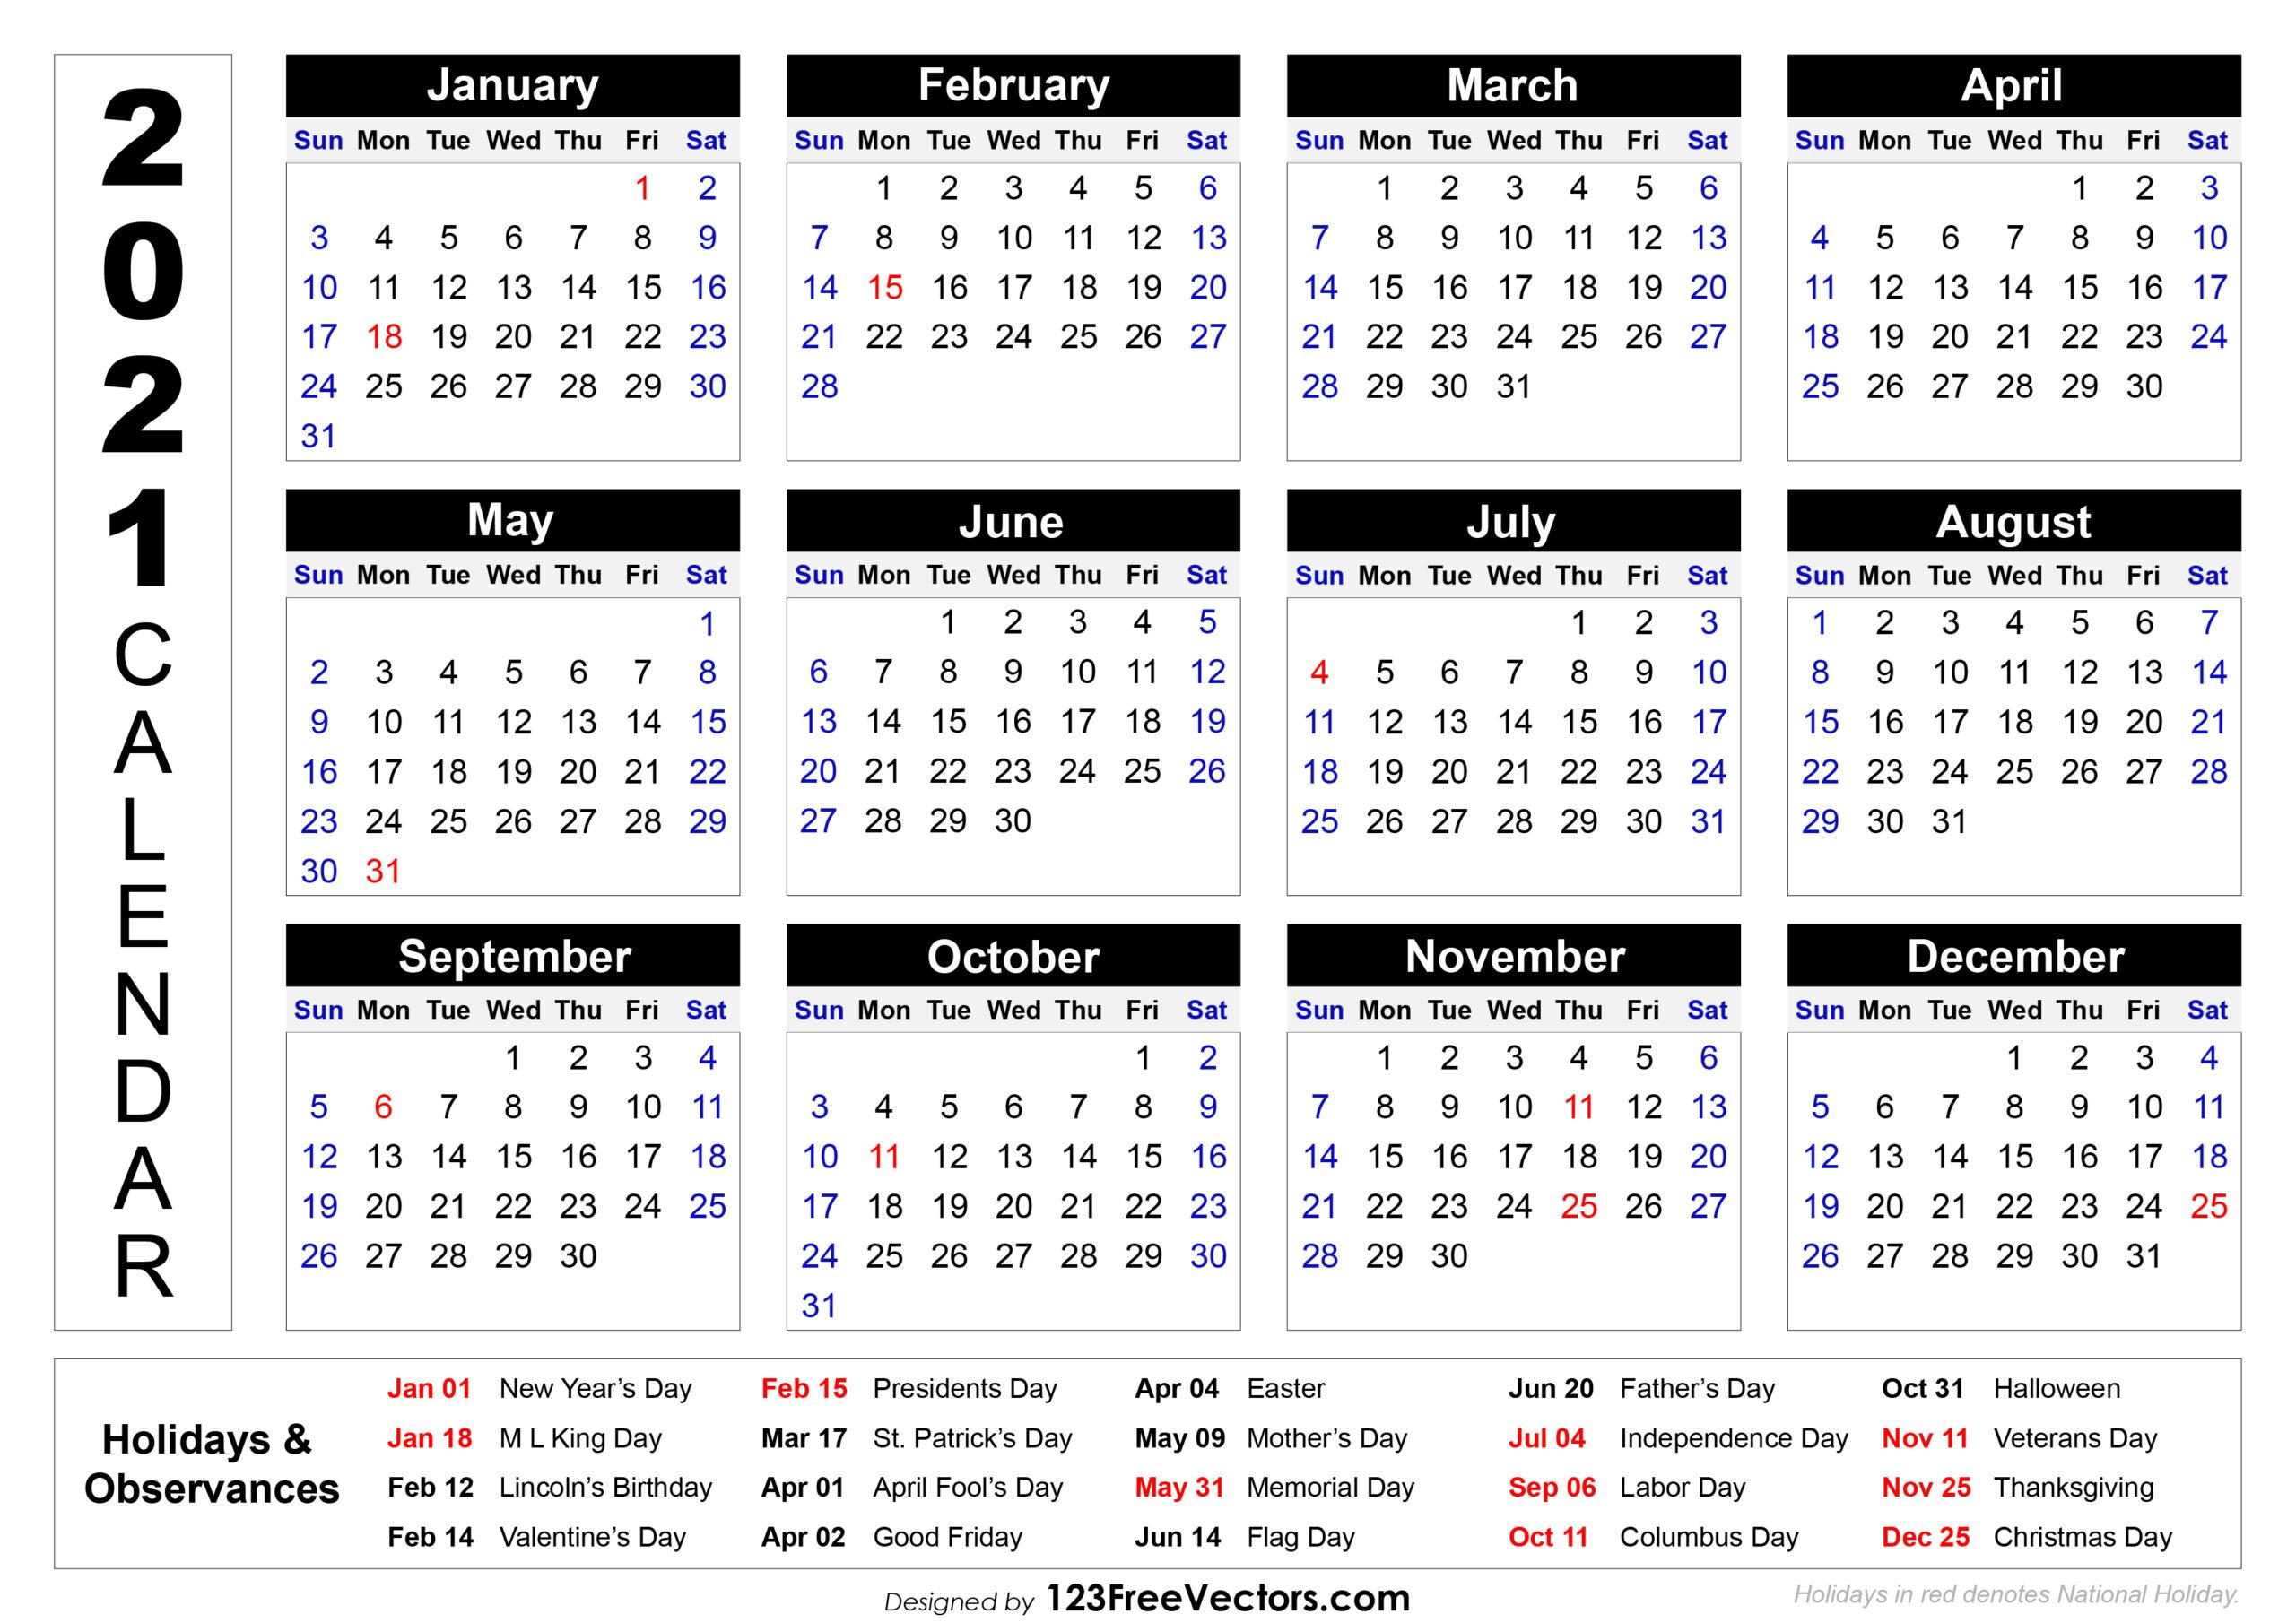 2021 Calendar Holidays And Observances | Printable in 2021 Calendar With Federal Printabl